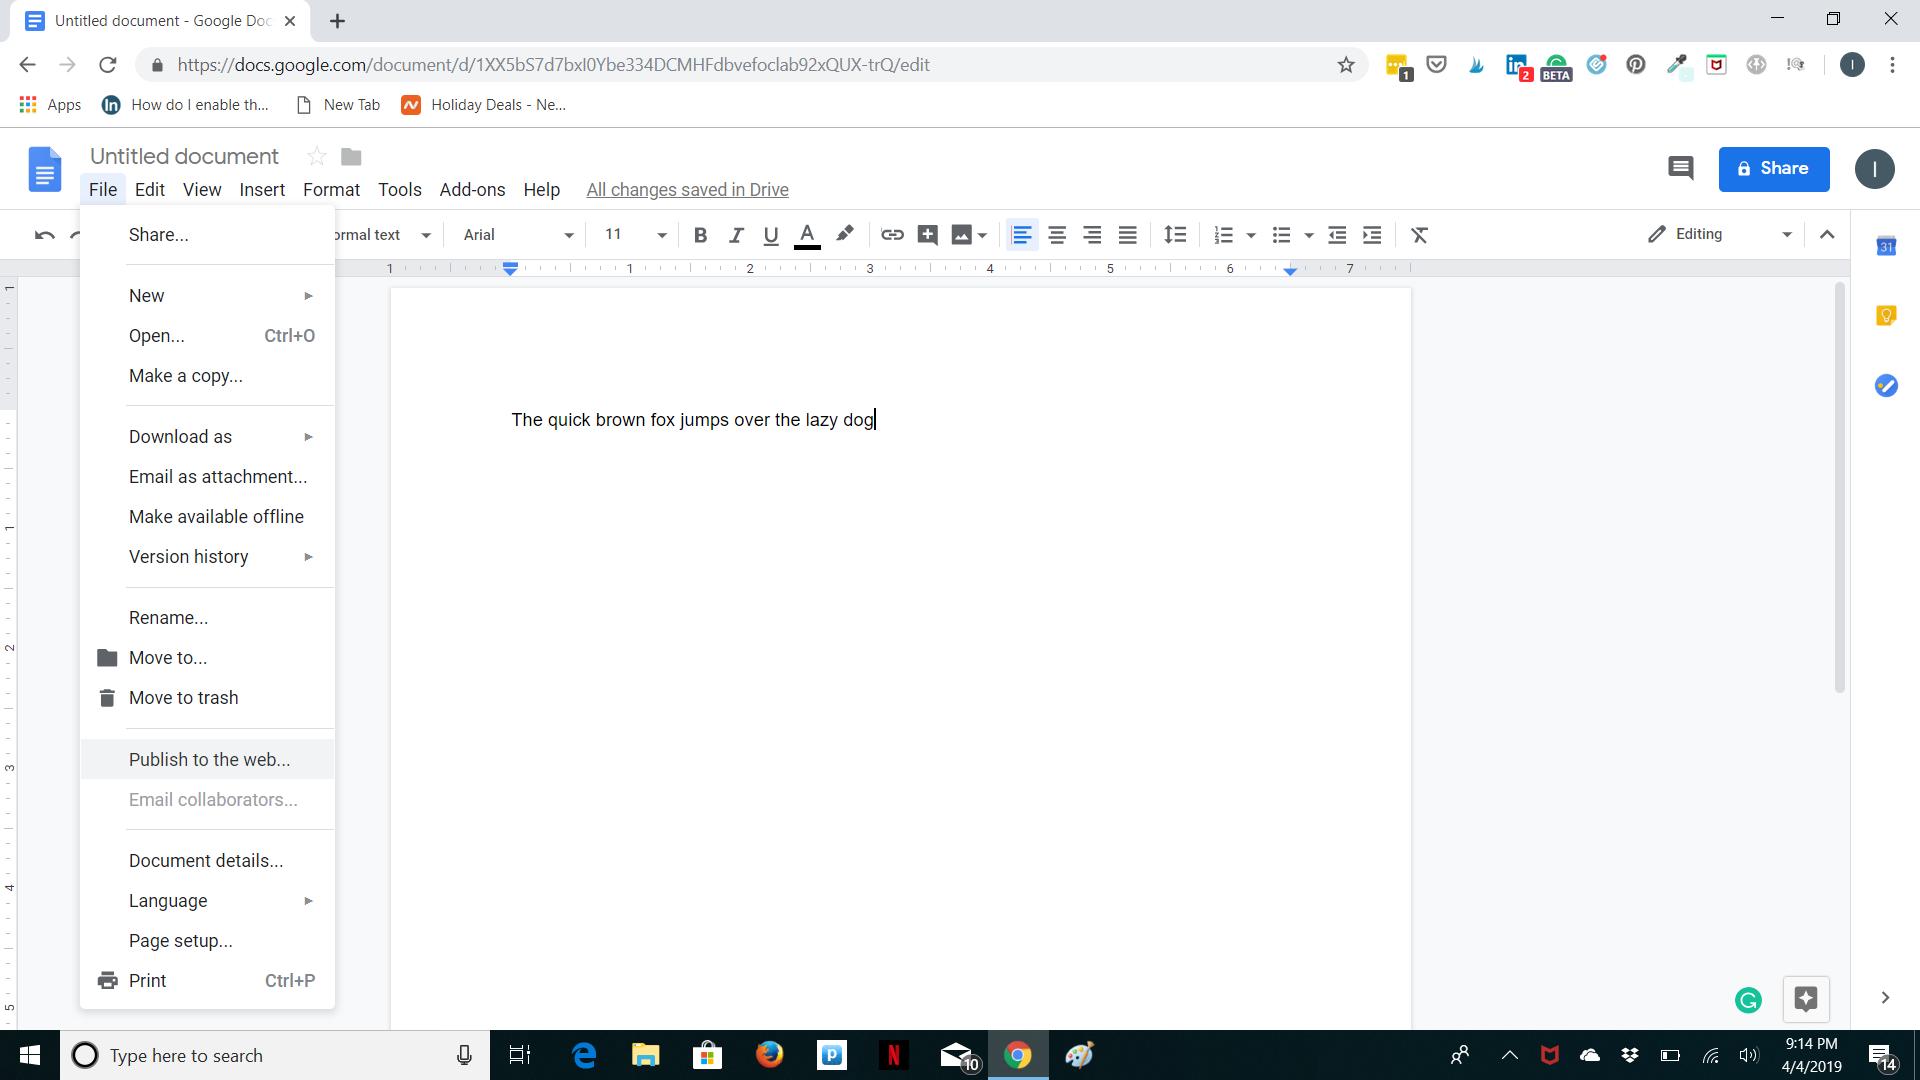 Google Docs Main Screen